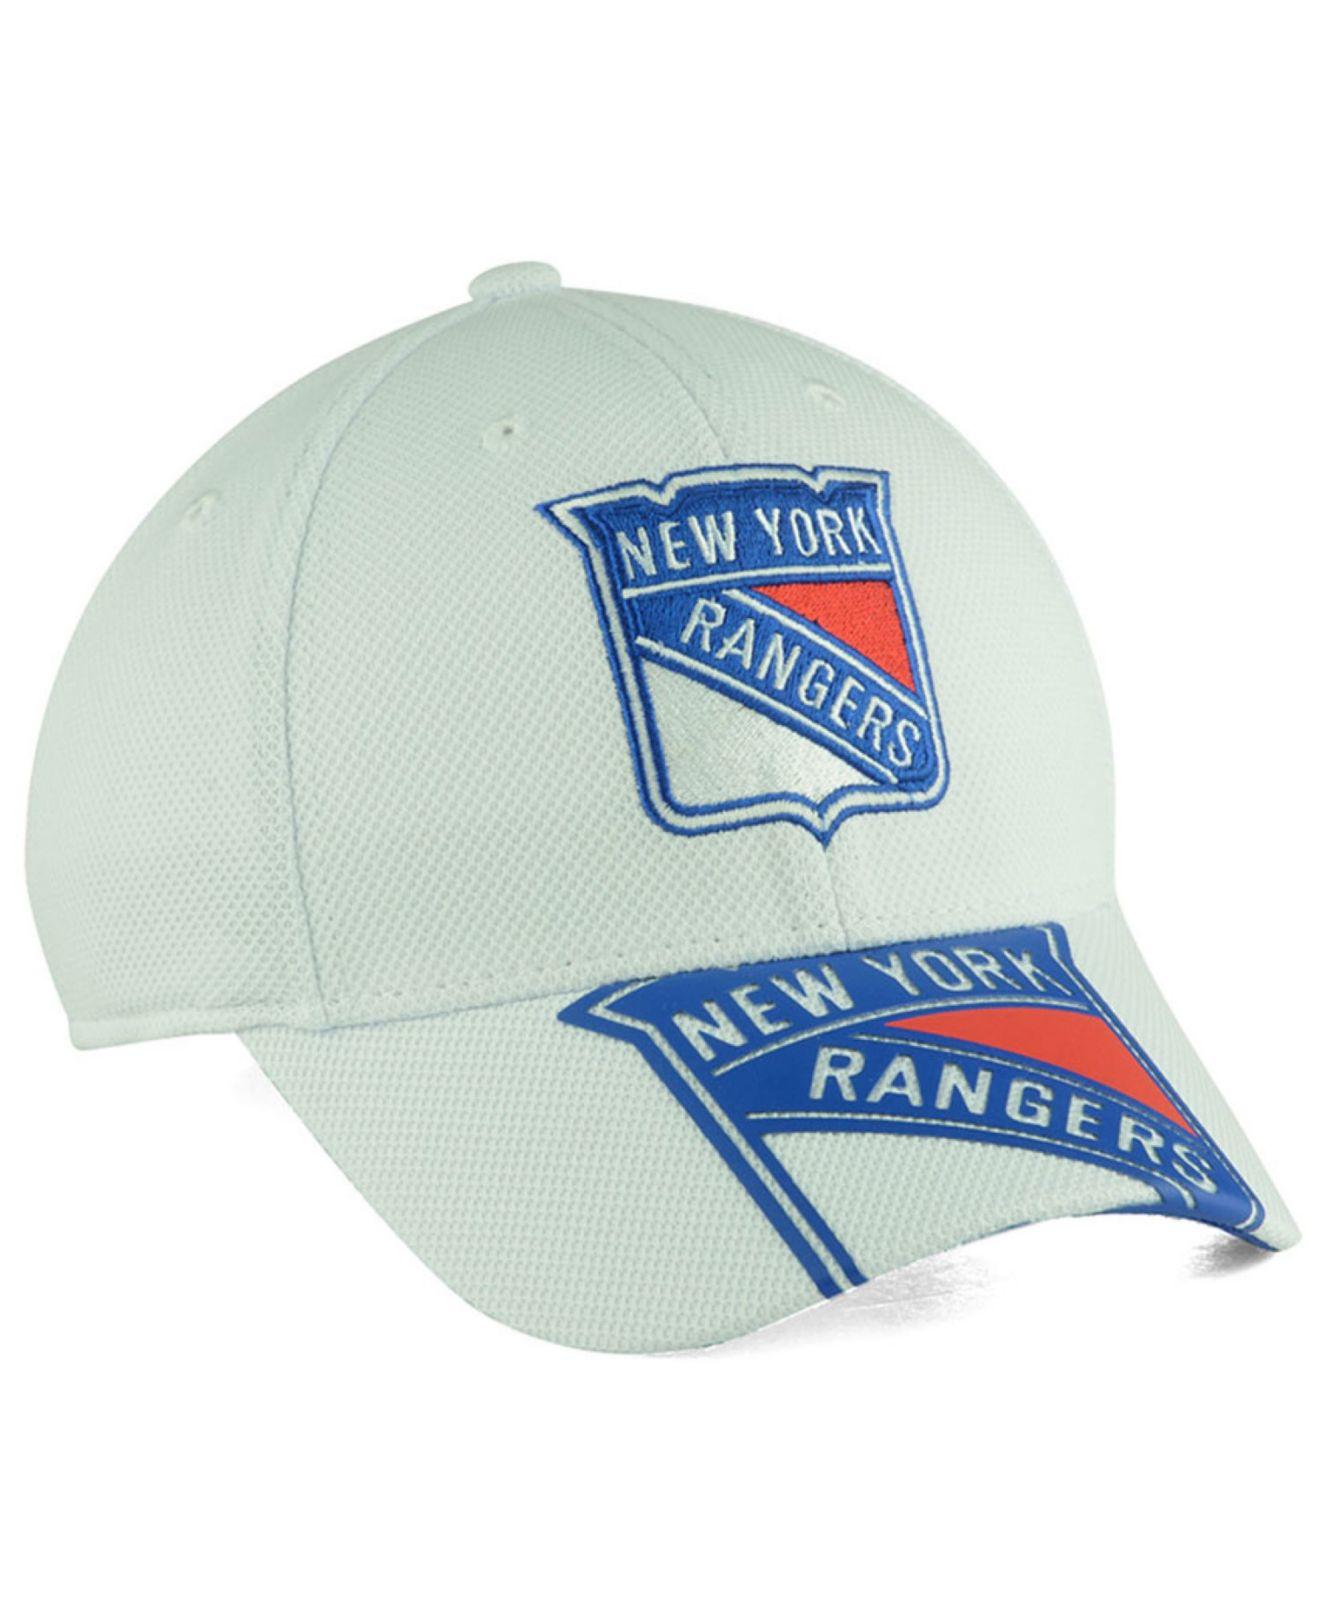 newest 6ae3d 657c6 ... hat 918dd cba23 reduced lyst reebok new york rangers 2nd season draft  flex cap in blue for men a7aa0 ...